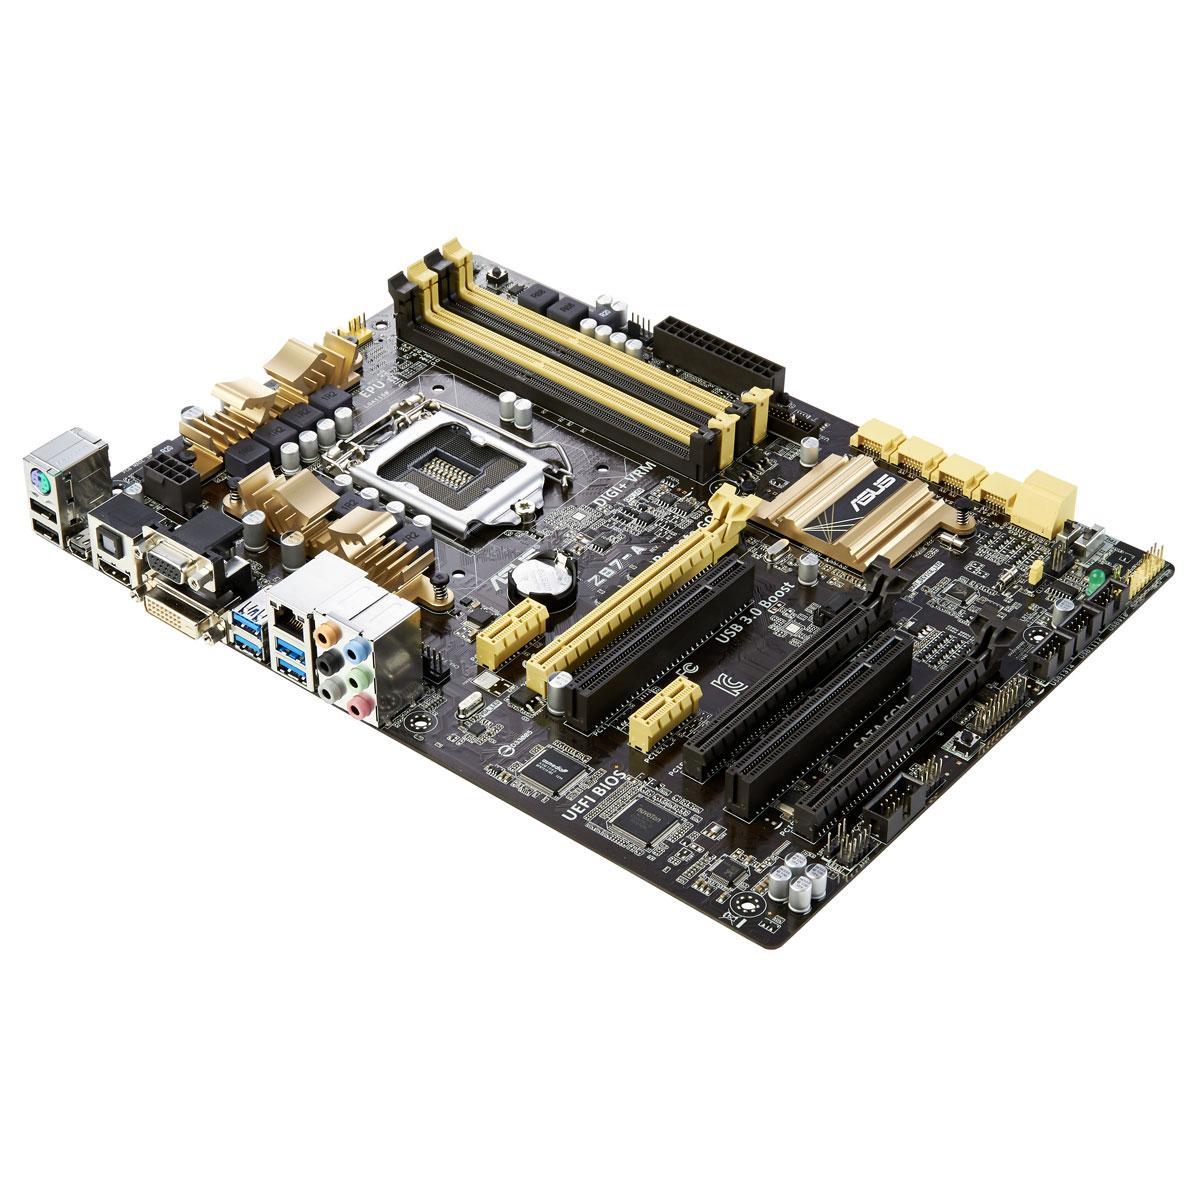 Carte mère ASUS Z87-A C2 Carte mère ATX Socket 1150 Intel Z87 Express - SATA 6Gb/s - USB 3.0 - 2x PCI-Express 3.0 16x + 1x PCI-Express 2.0 16x